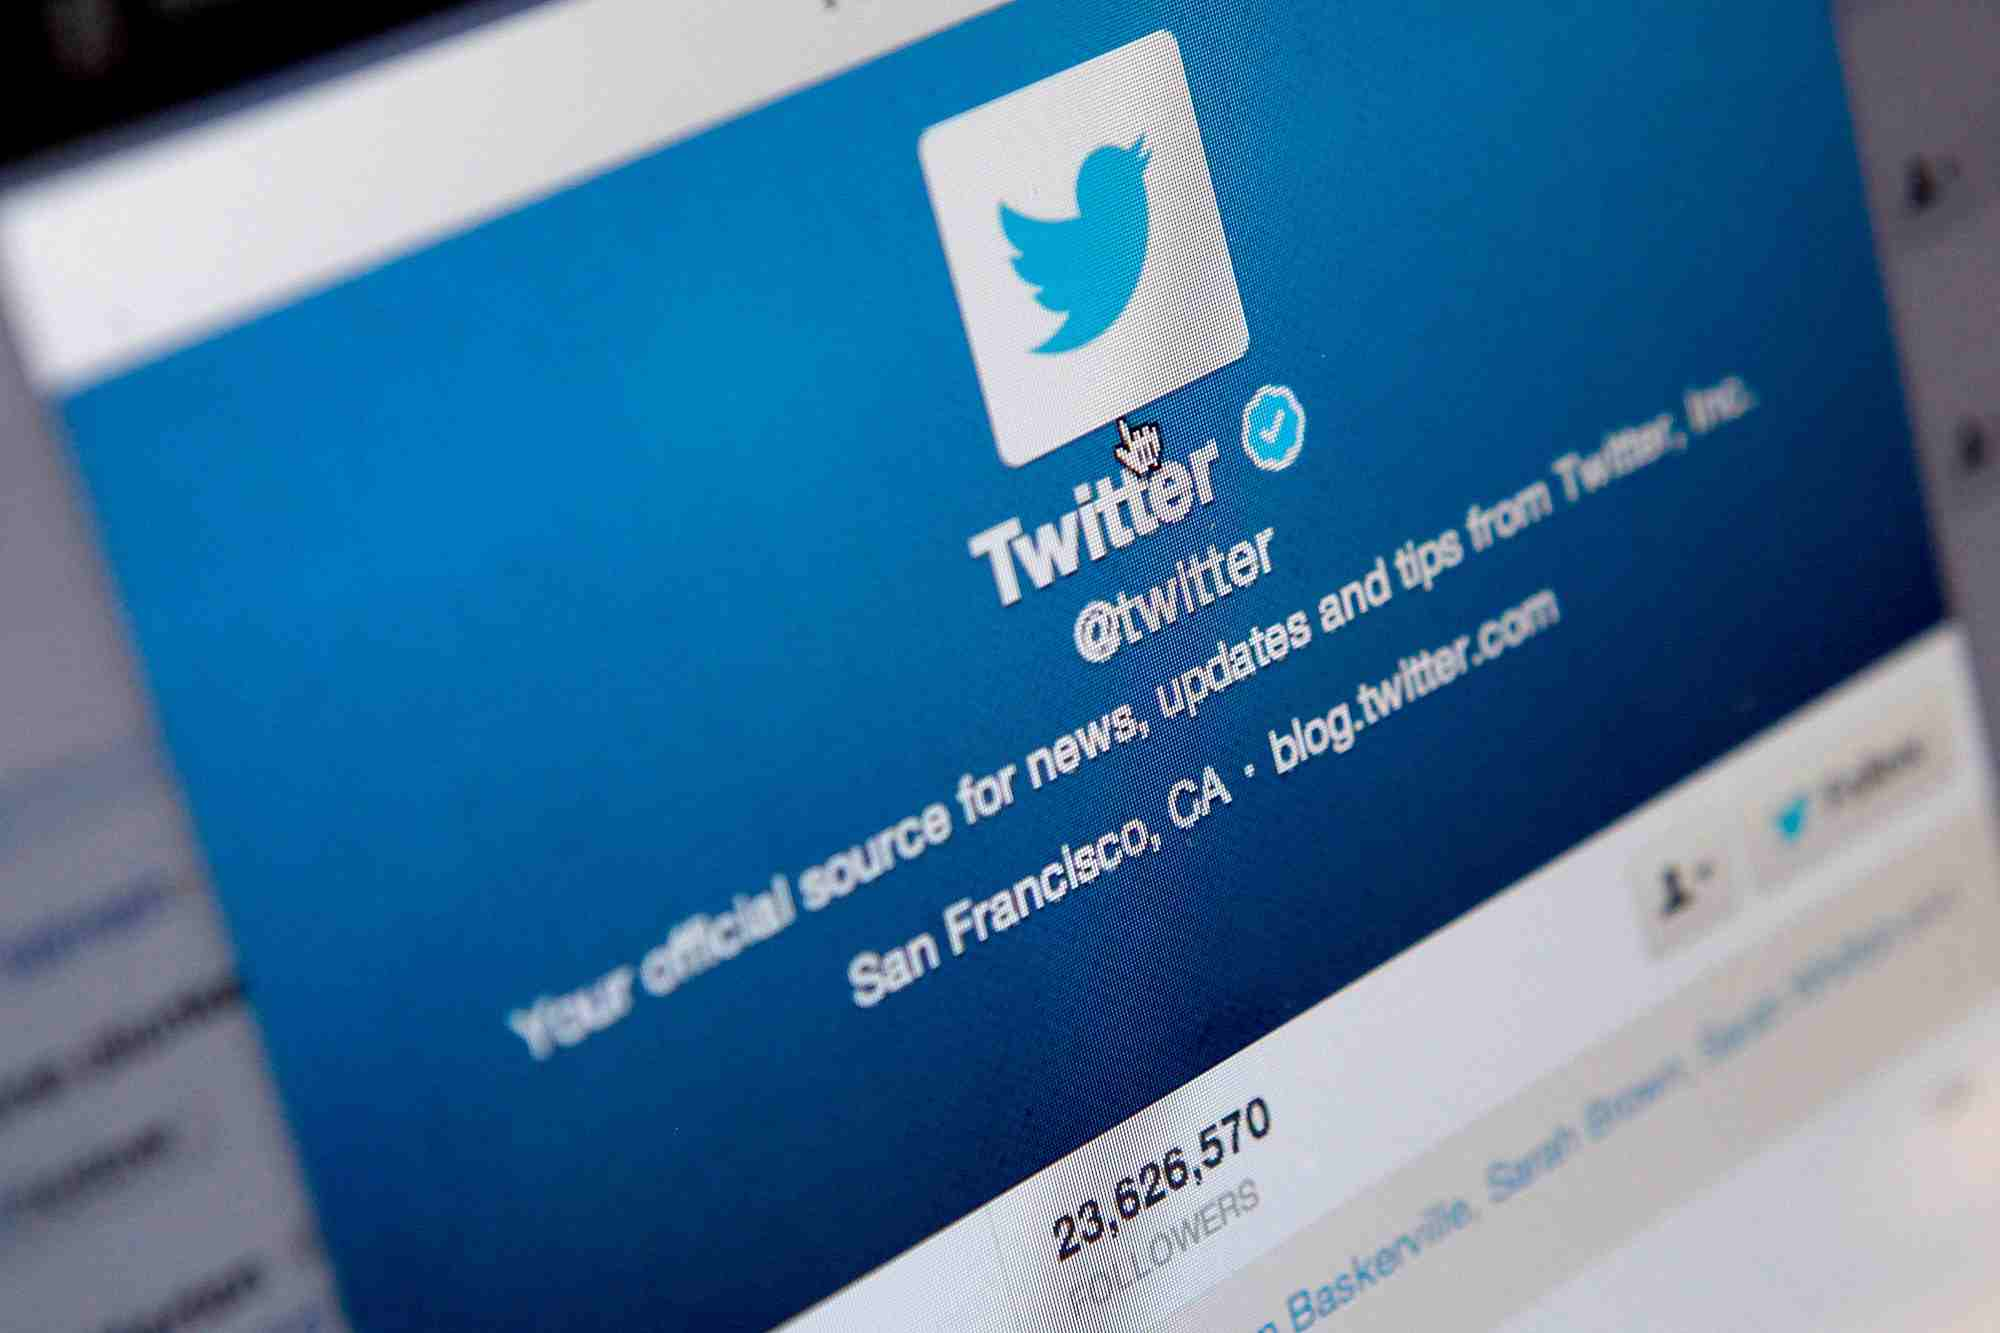 twitter bans 1,25,000 twitter accounts